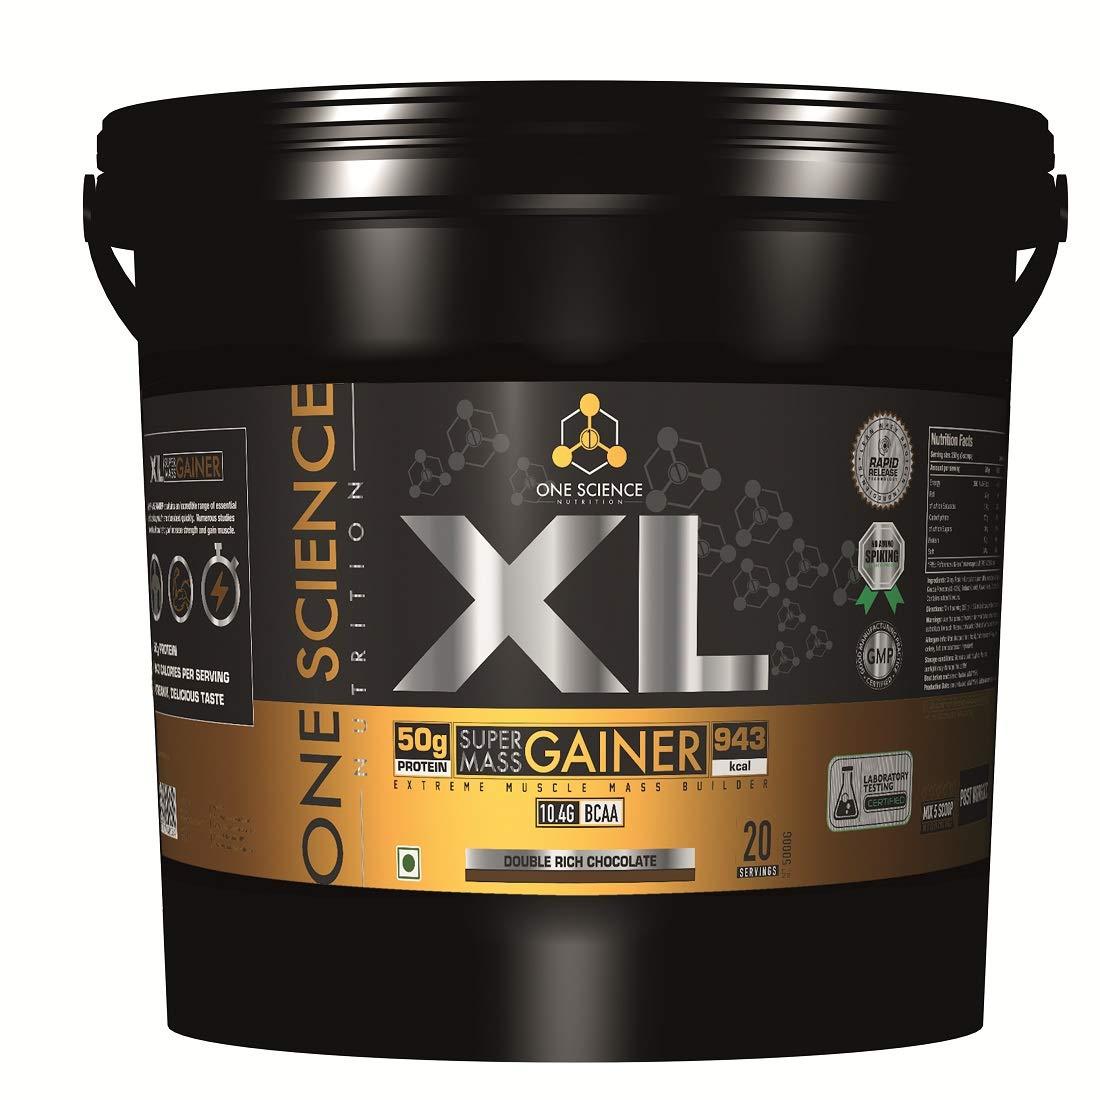 nutriara One Science Nutrition XL Super Mass Gainer 11lb